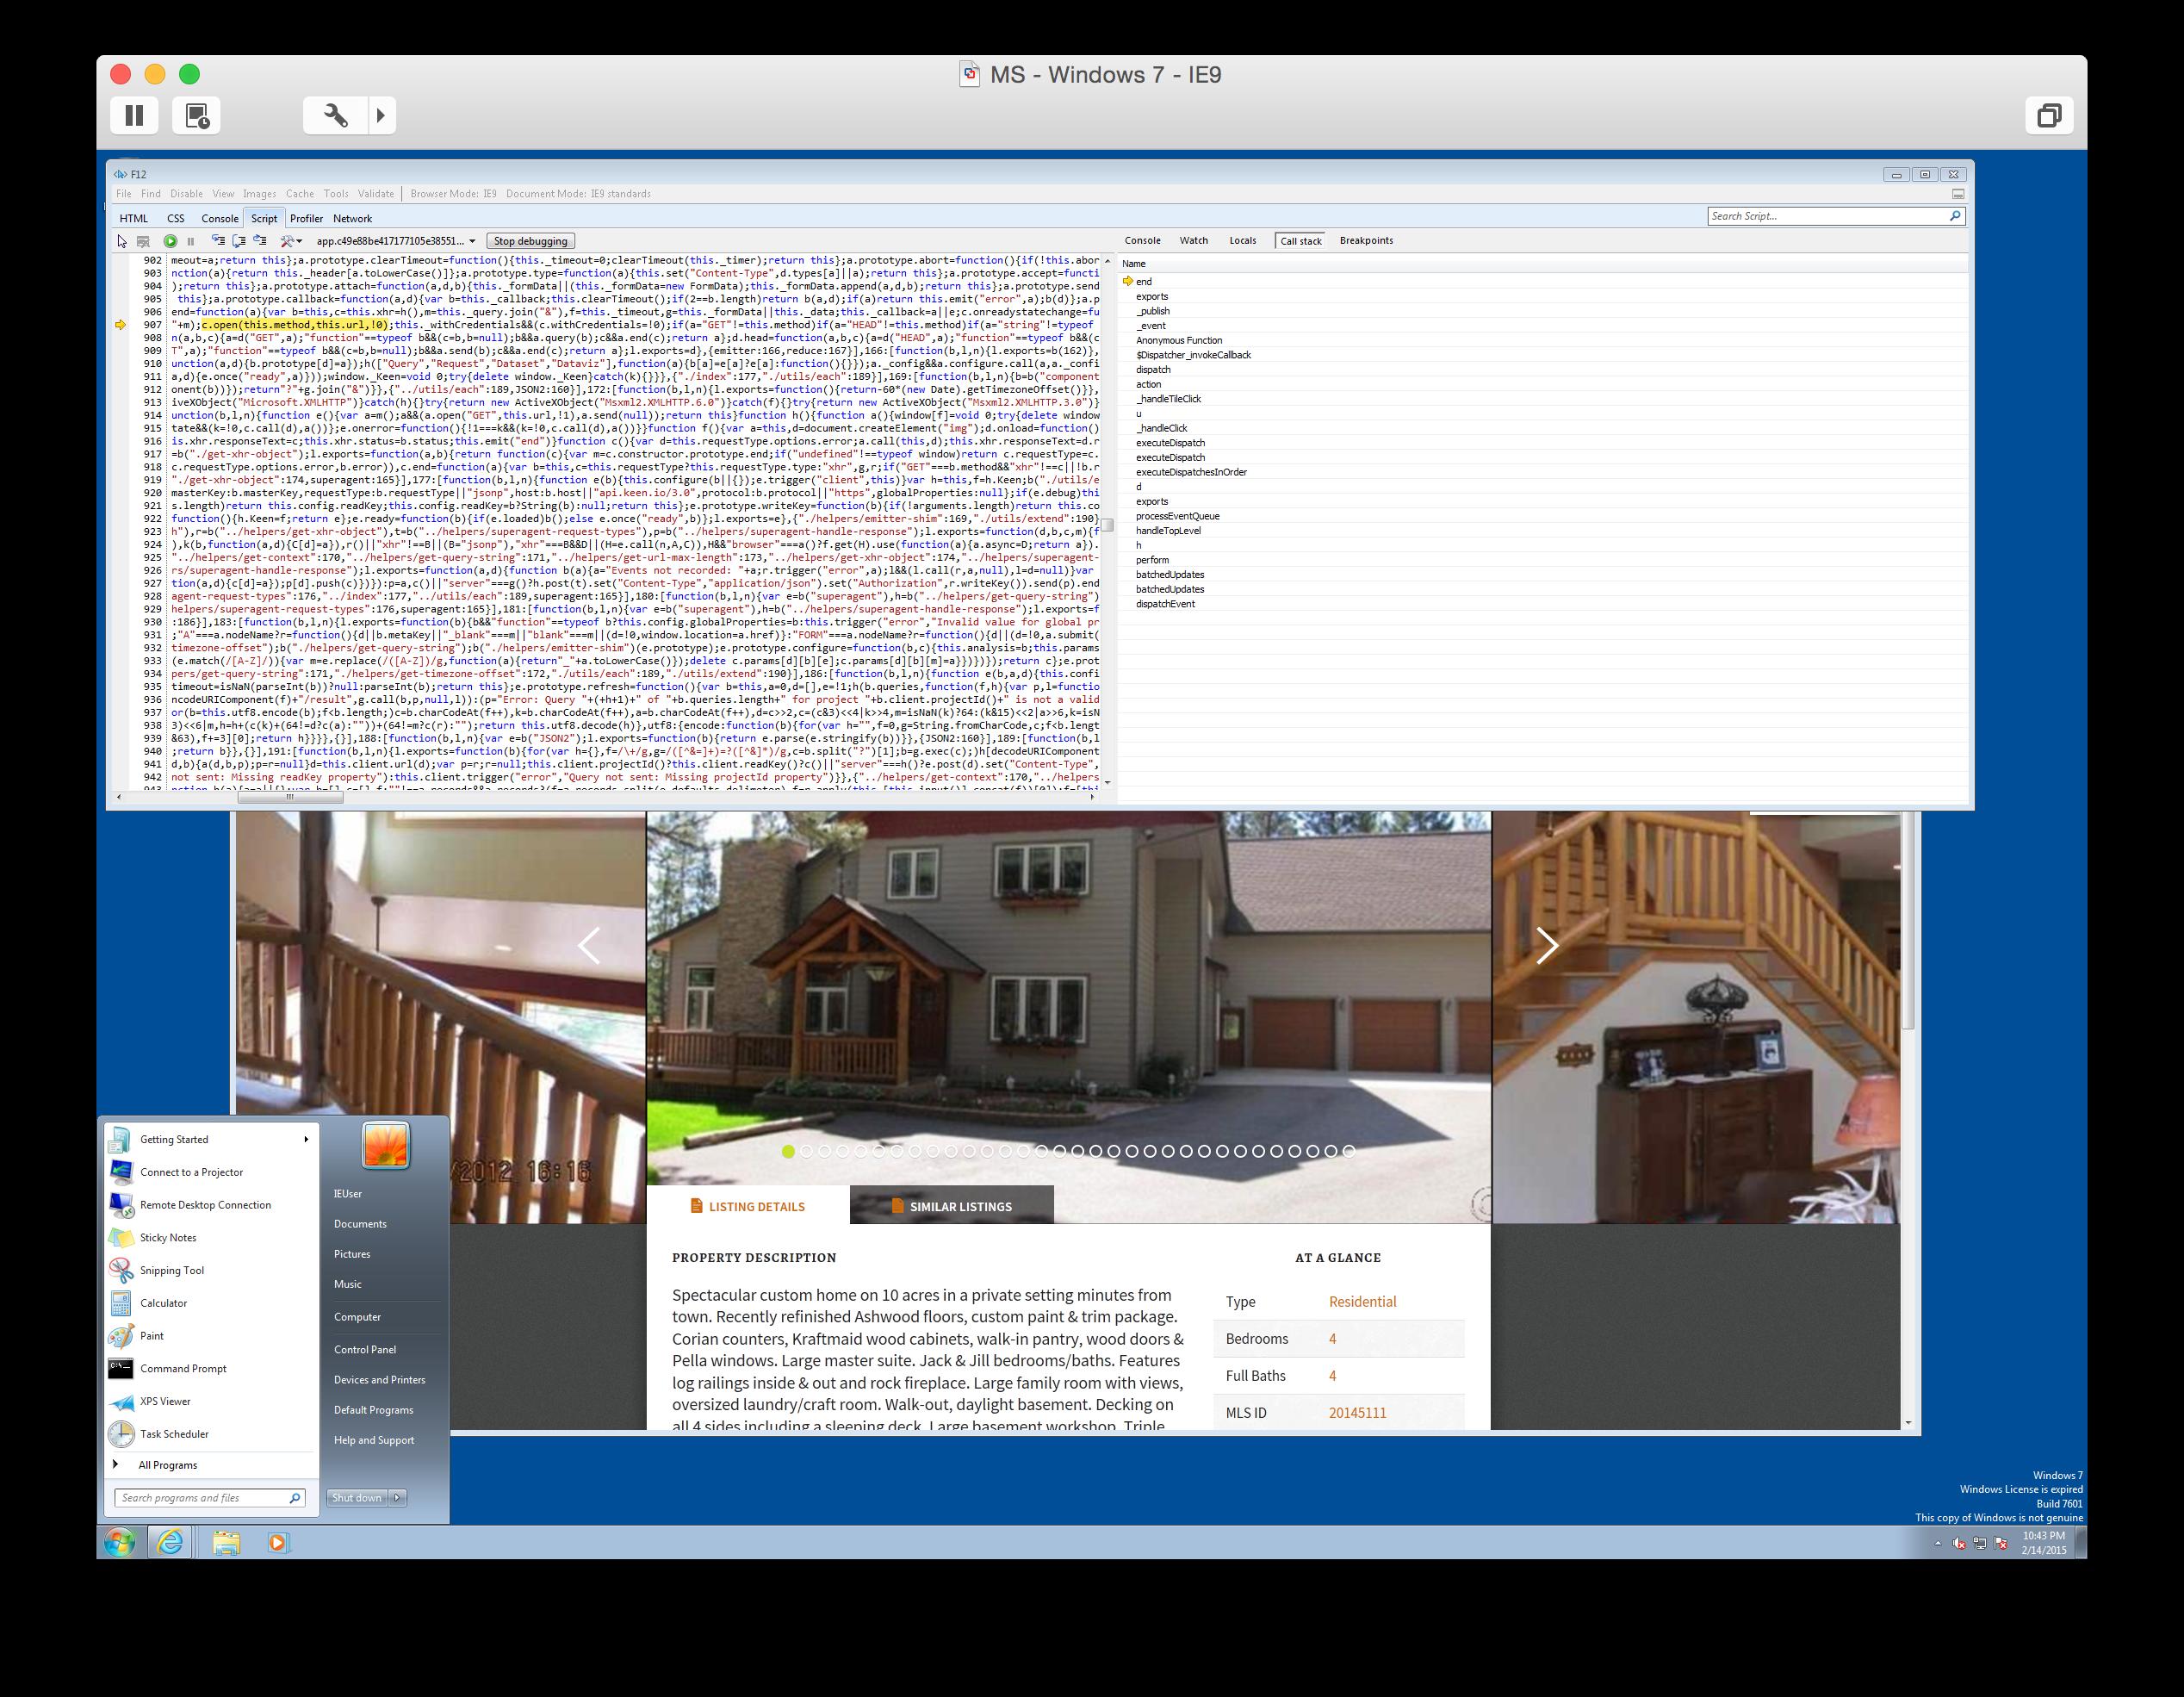 screenshot 2015-02-15 01 43 07